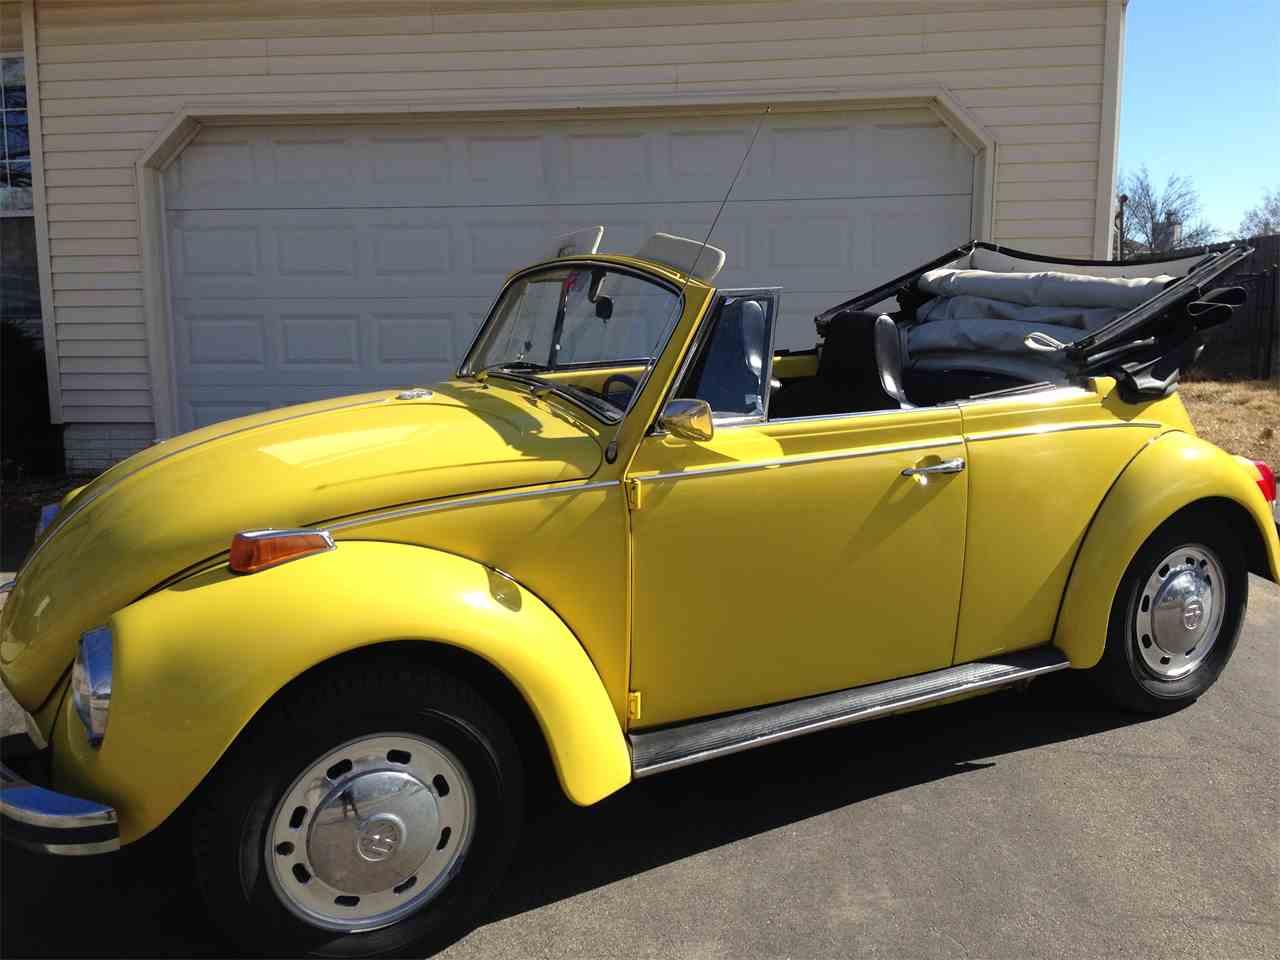 1971 Volkswagen Super Beetle For Sale Classiccars Com